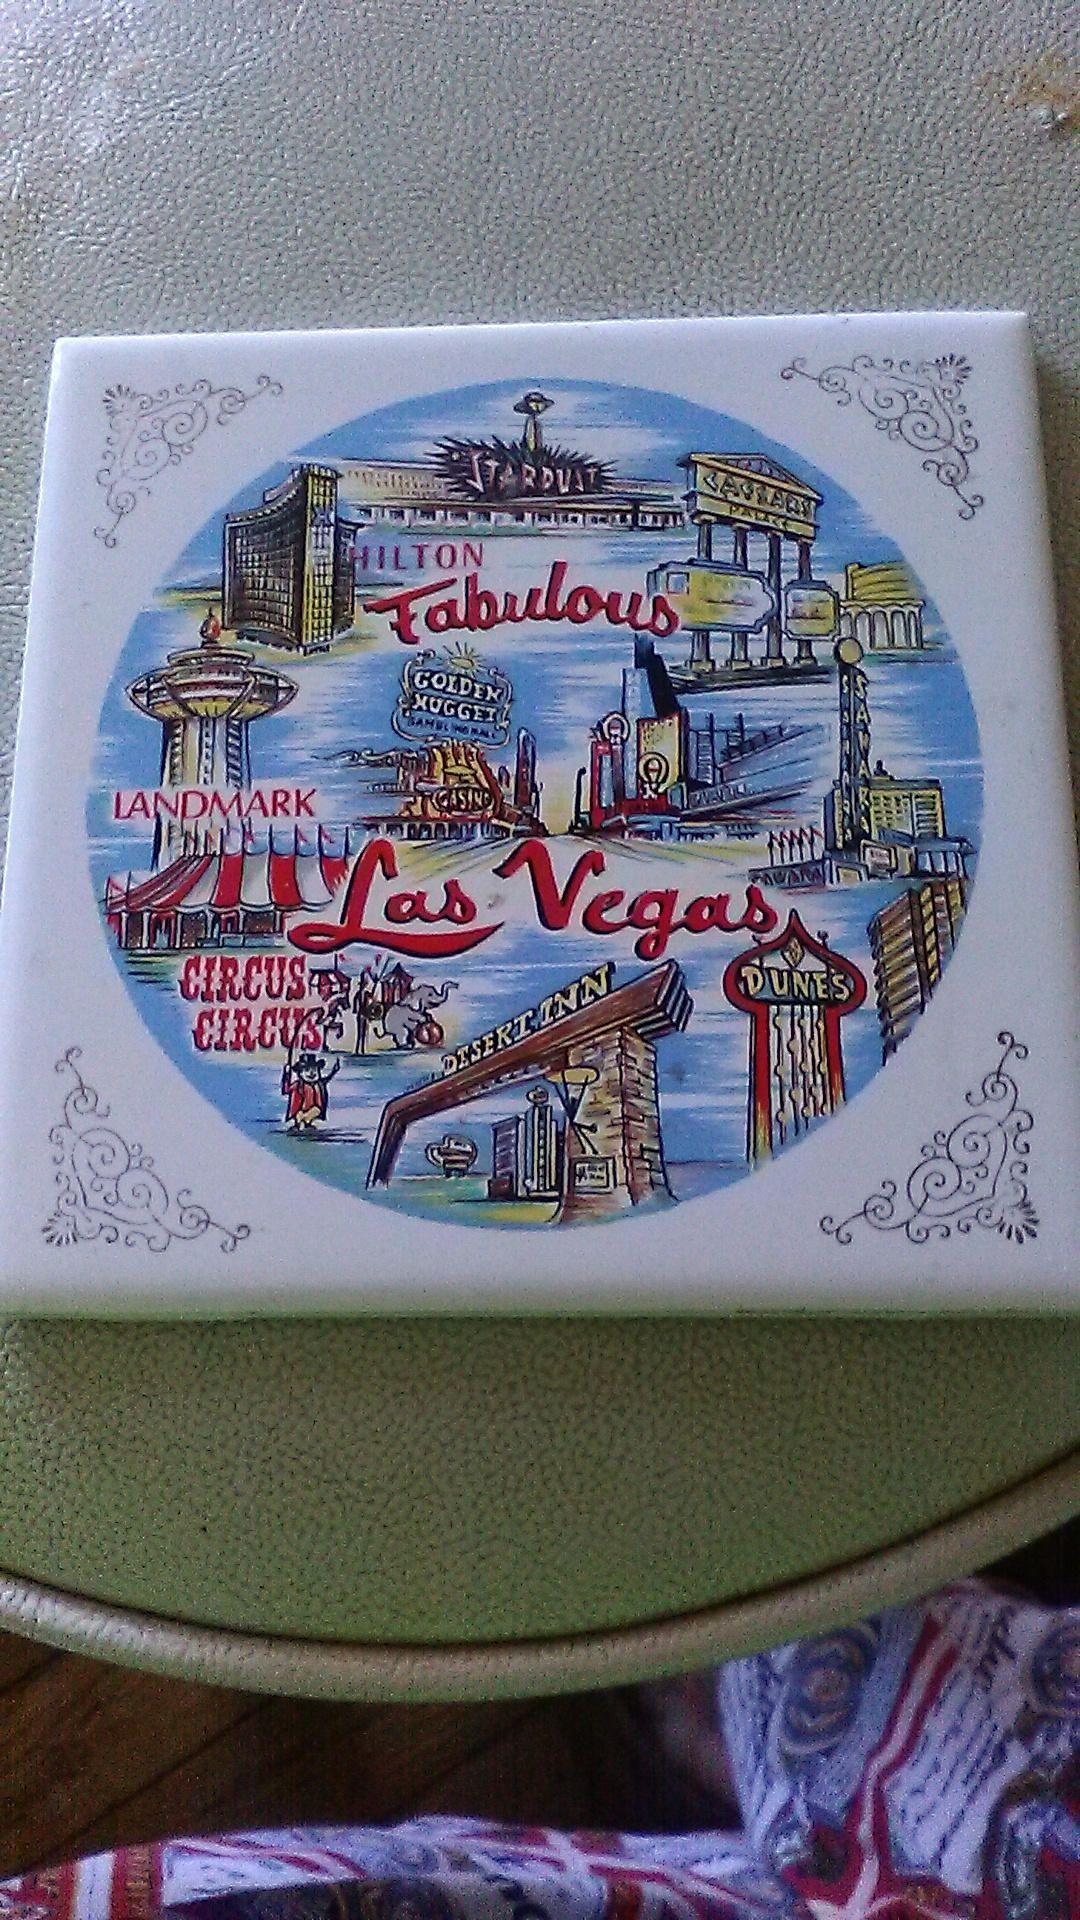 Mid Century Fabulous Las Vegas Ceramic Tile Hotels Landmark Hilton